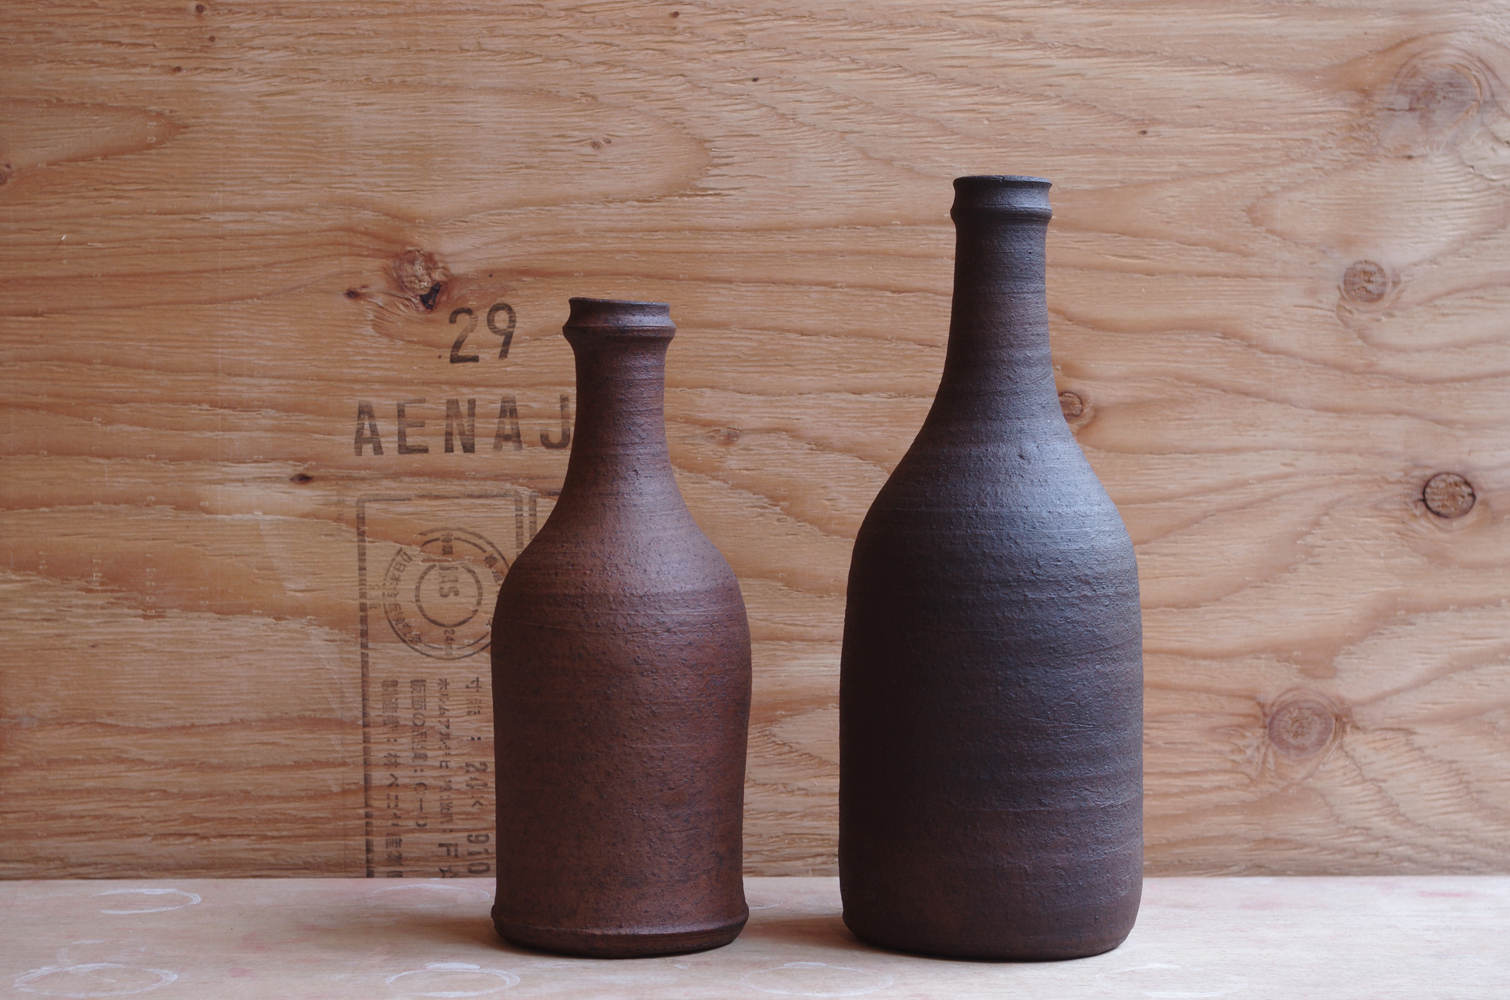 yoji-yamada-works-29